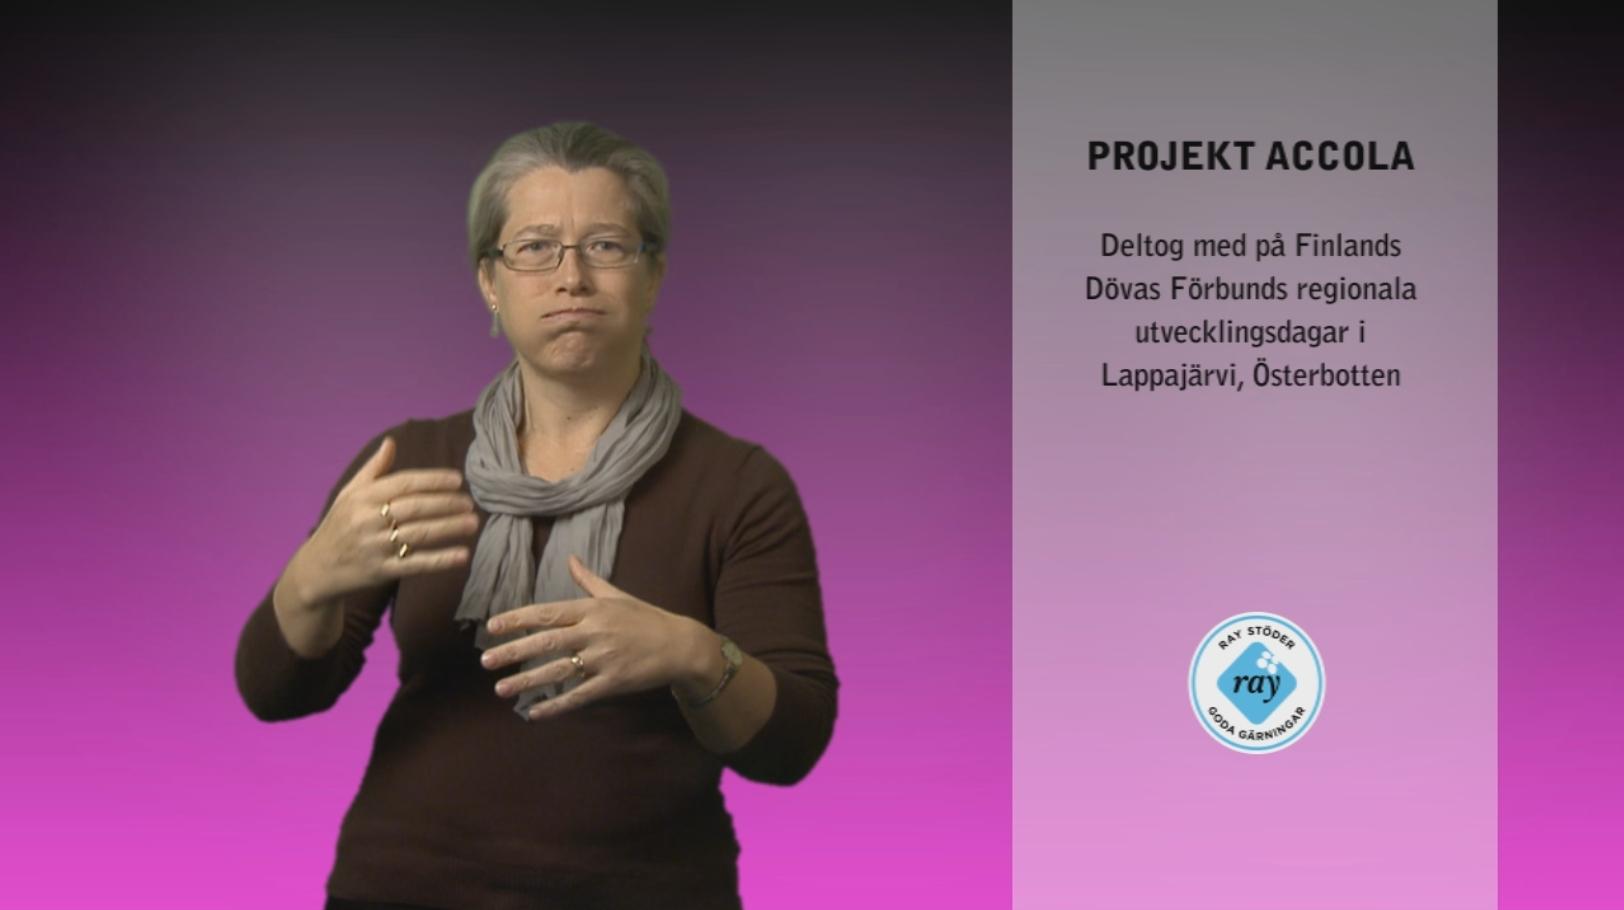 Accola projekt information – November